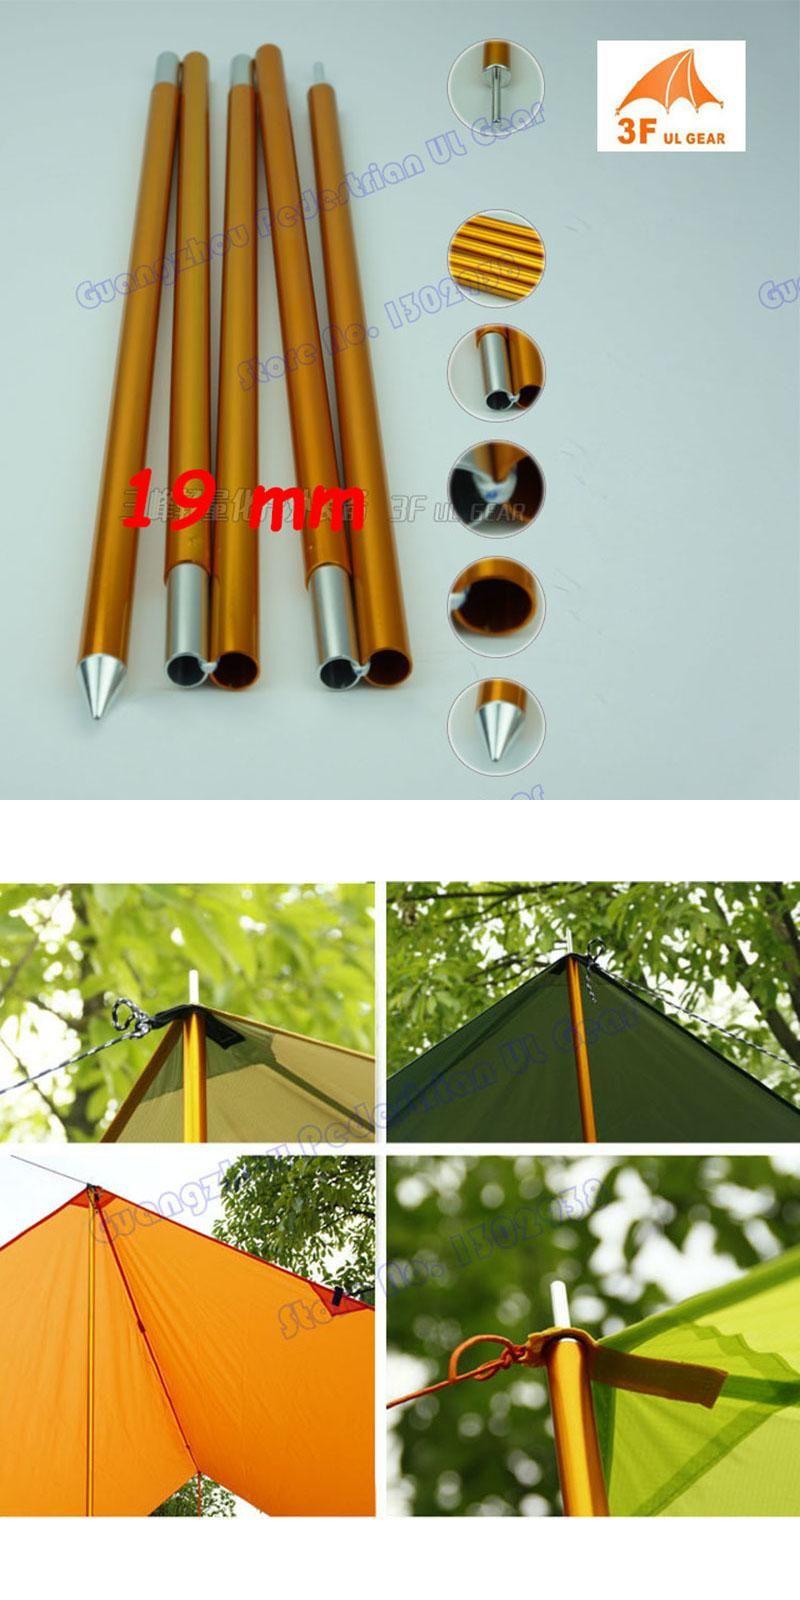 Visit To Buy 1 Pair Tent Tarp Sun Shelter Awning Canopy Poles 7075 Aluminum Ultralight Adjustable Support Poles 3f Ul Gear Adver Tent Tarp Awning Canopy Tableware